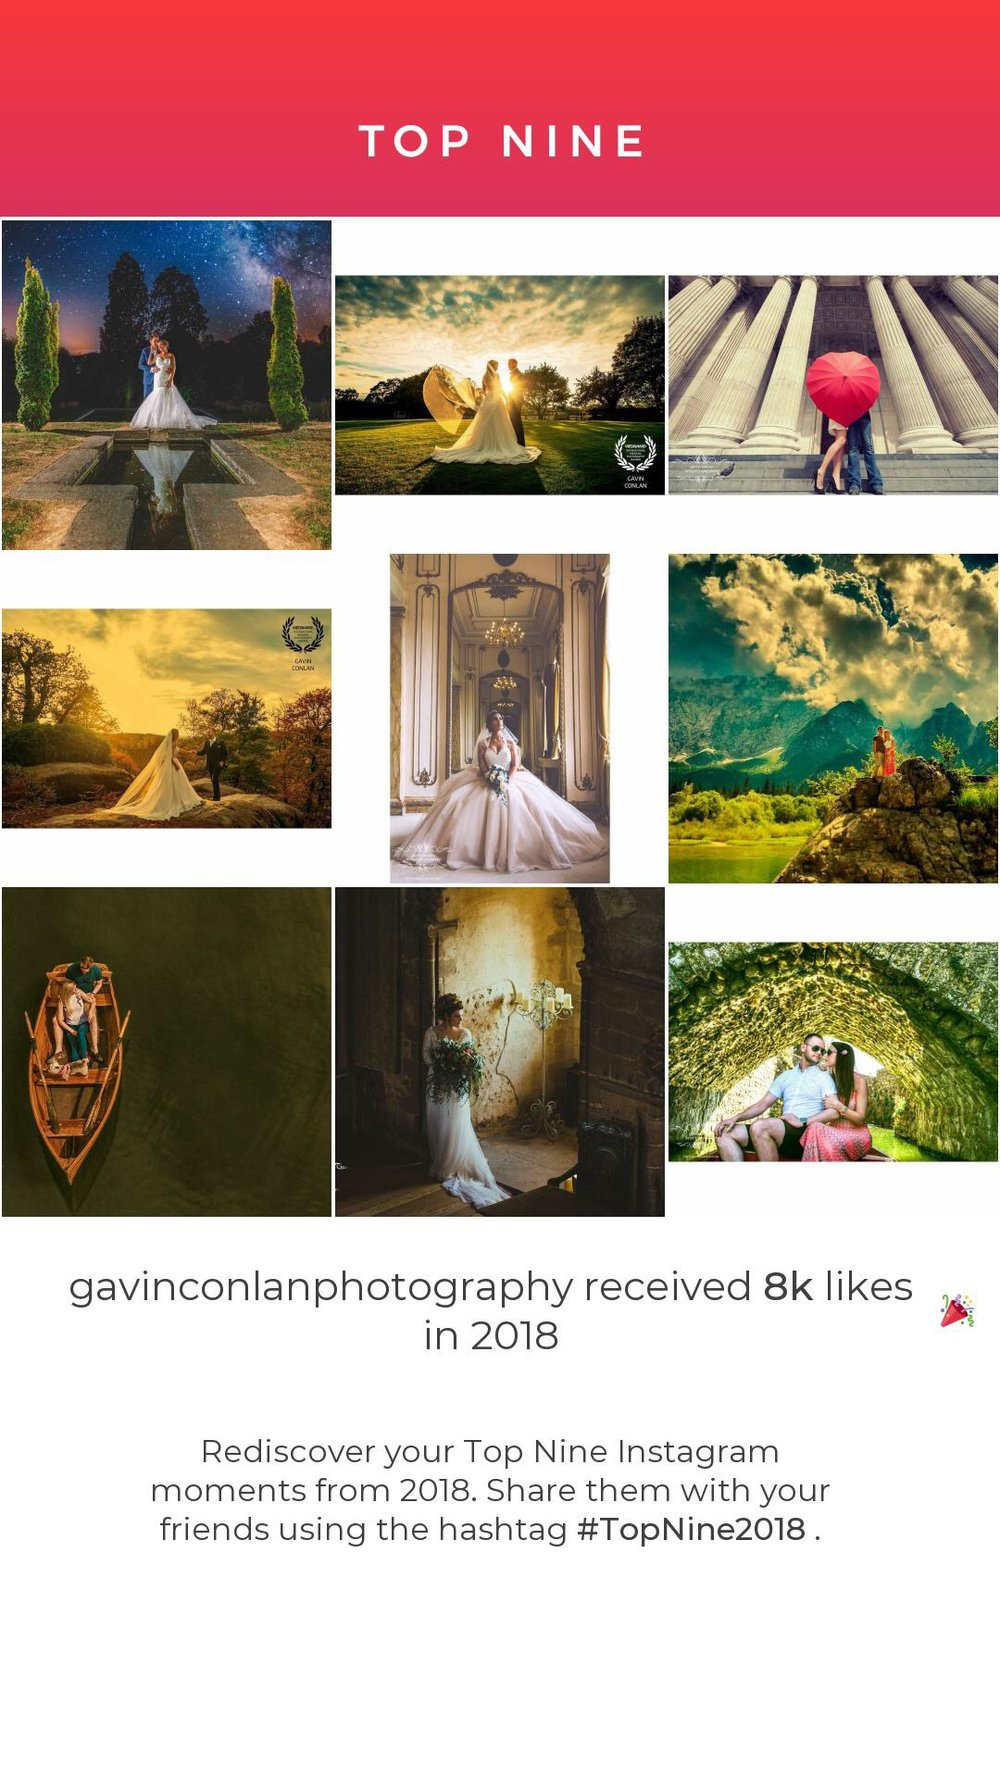 instagram-top-nine-from-gavin-conlan-photography